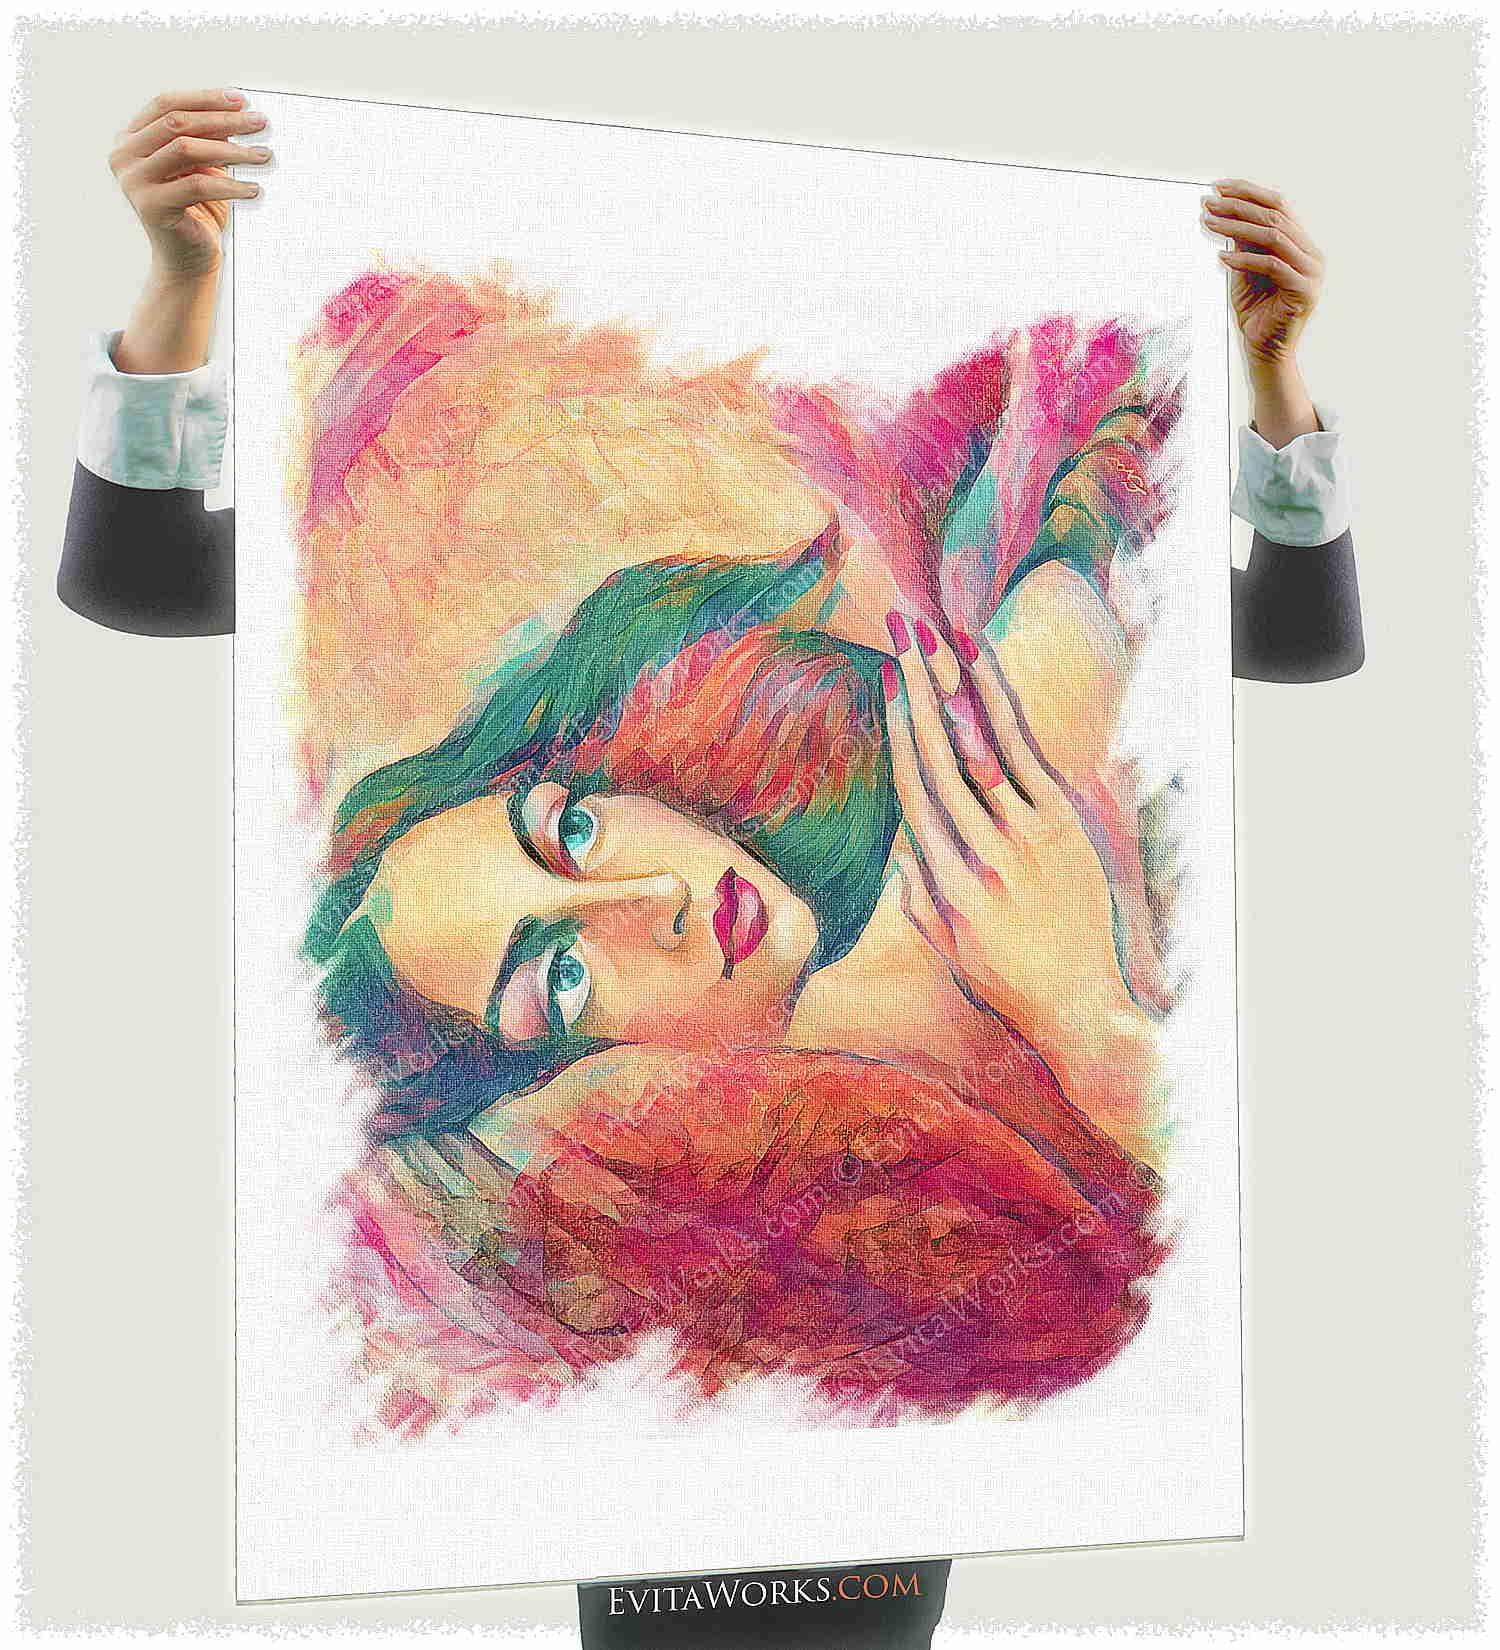 a3 rosalia a1 ~ EvitaWorks